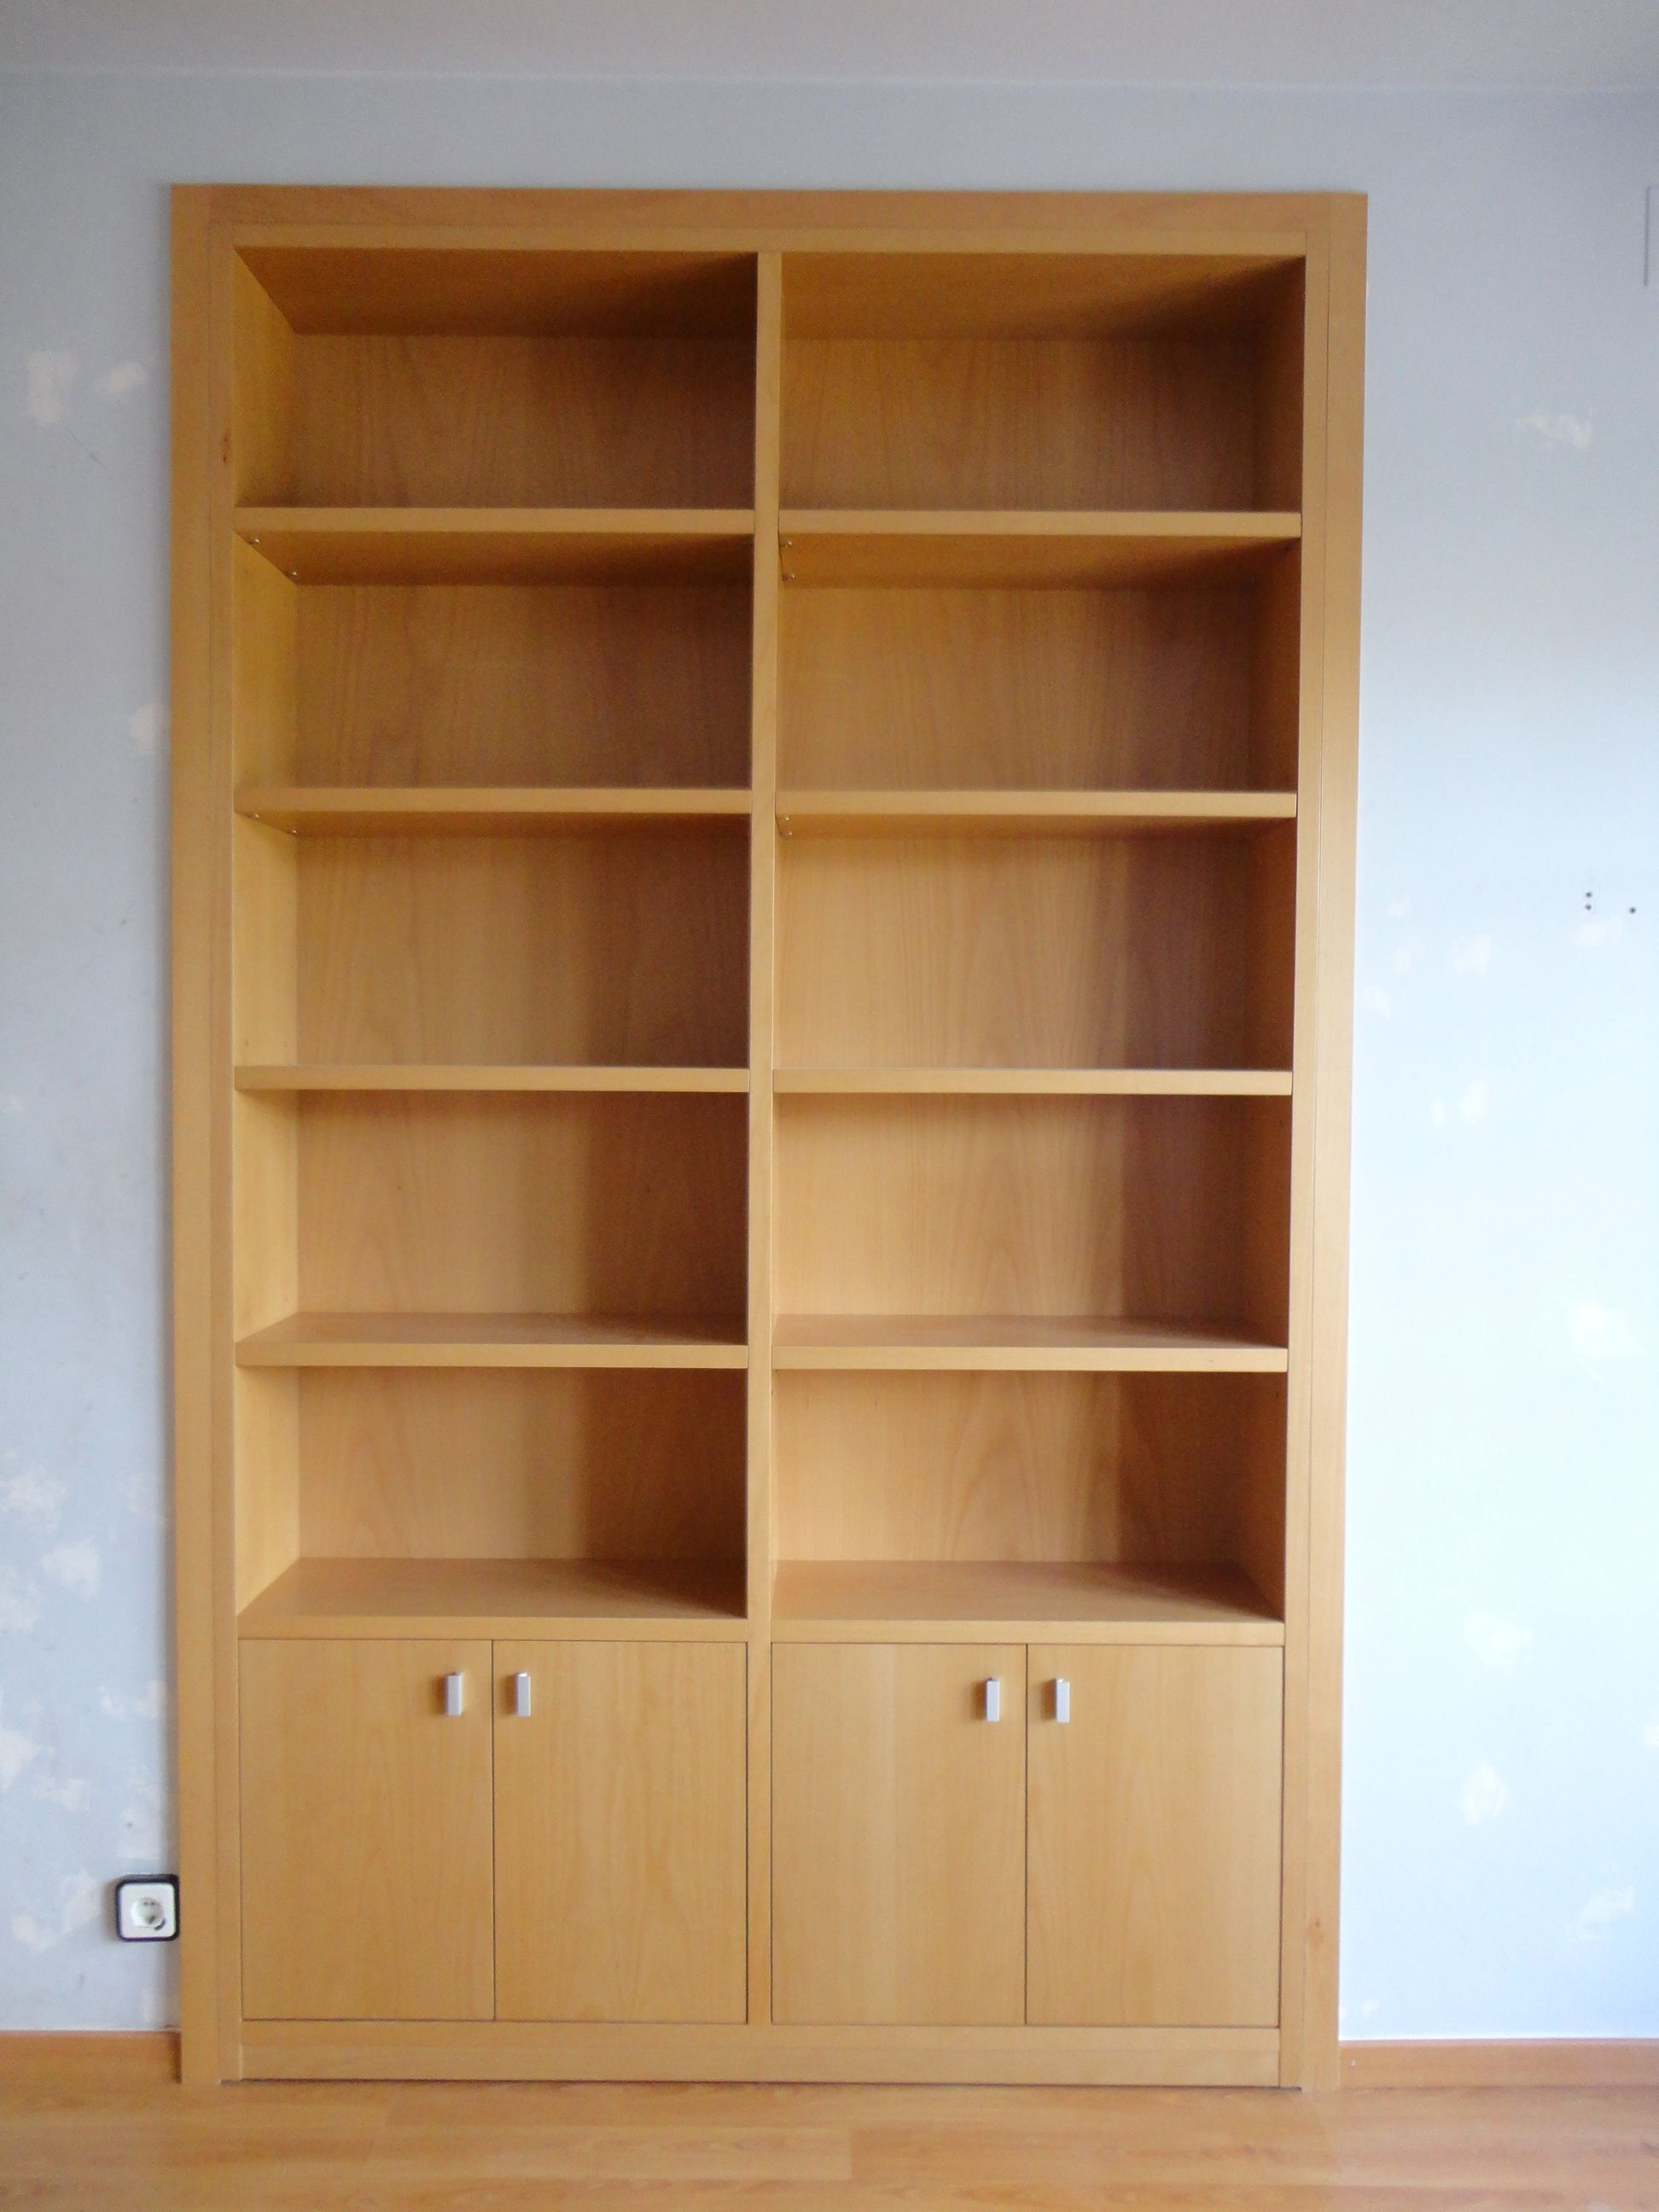 Mueble libreria a medida en madera de haya vaporizada - Librerias a medida ...